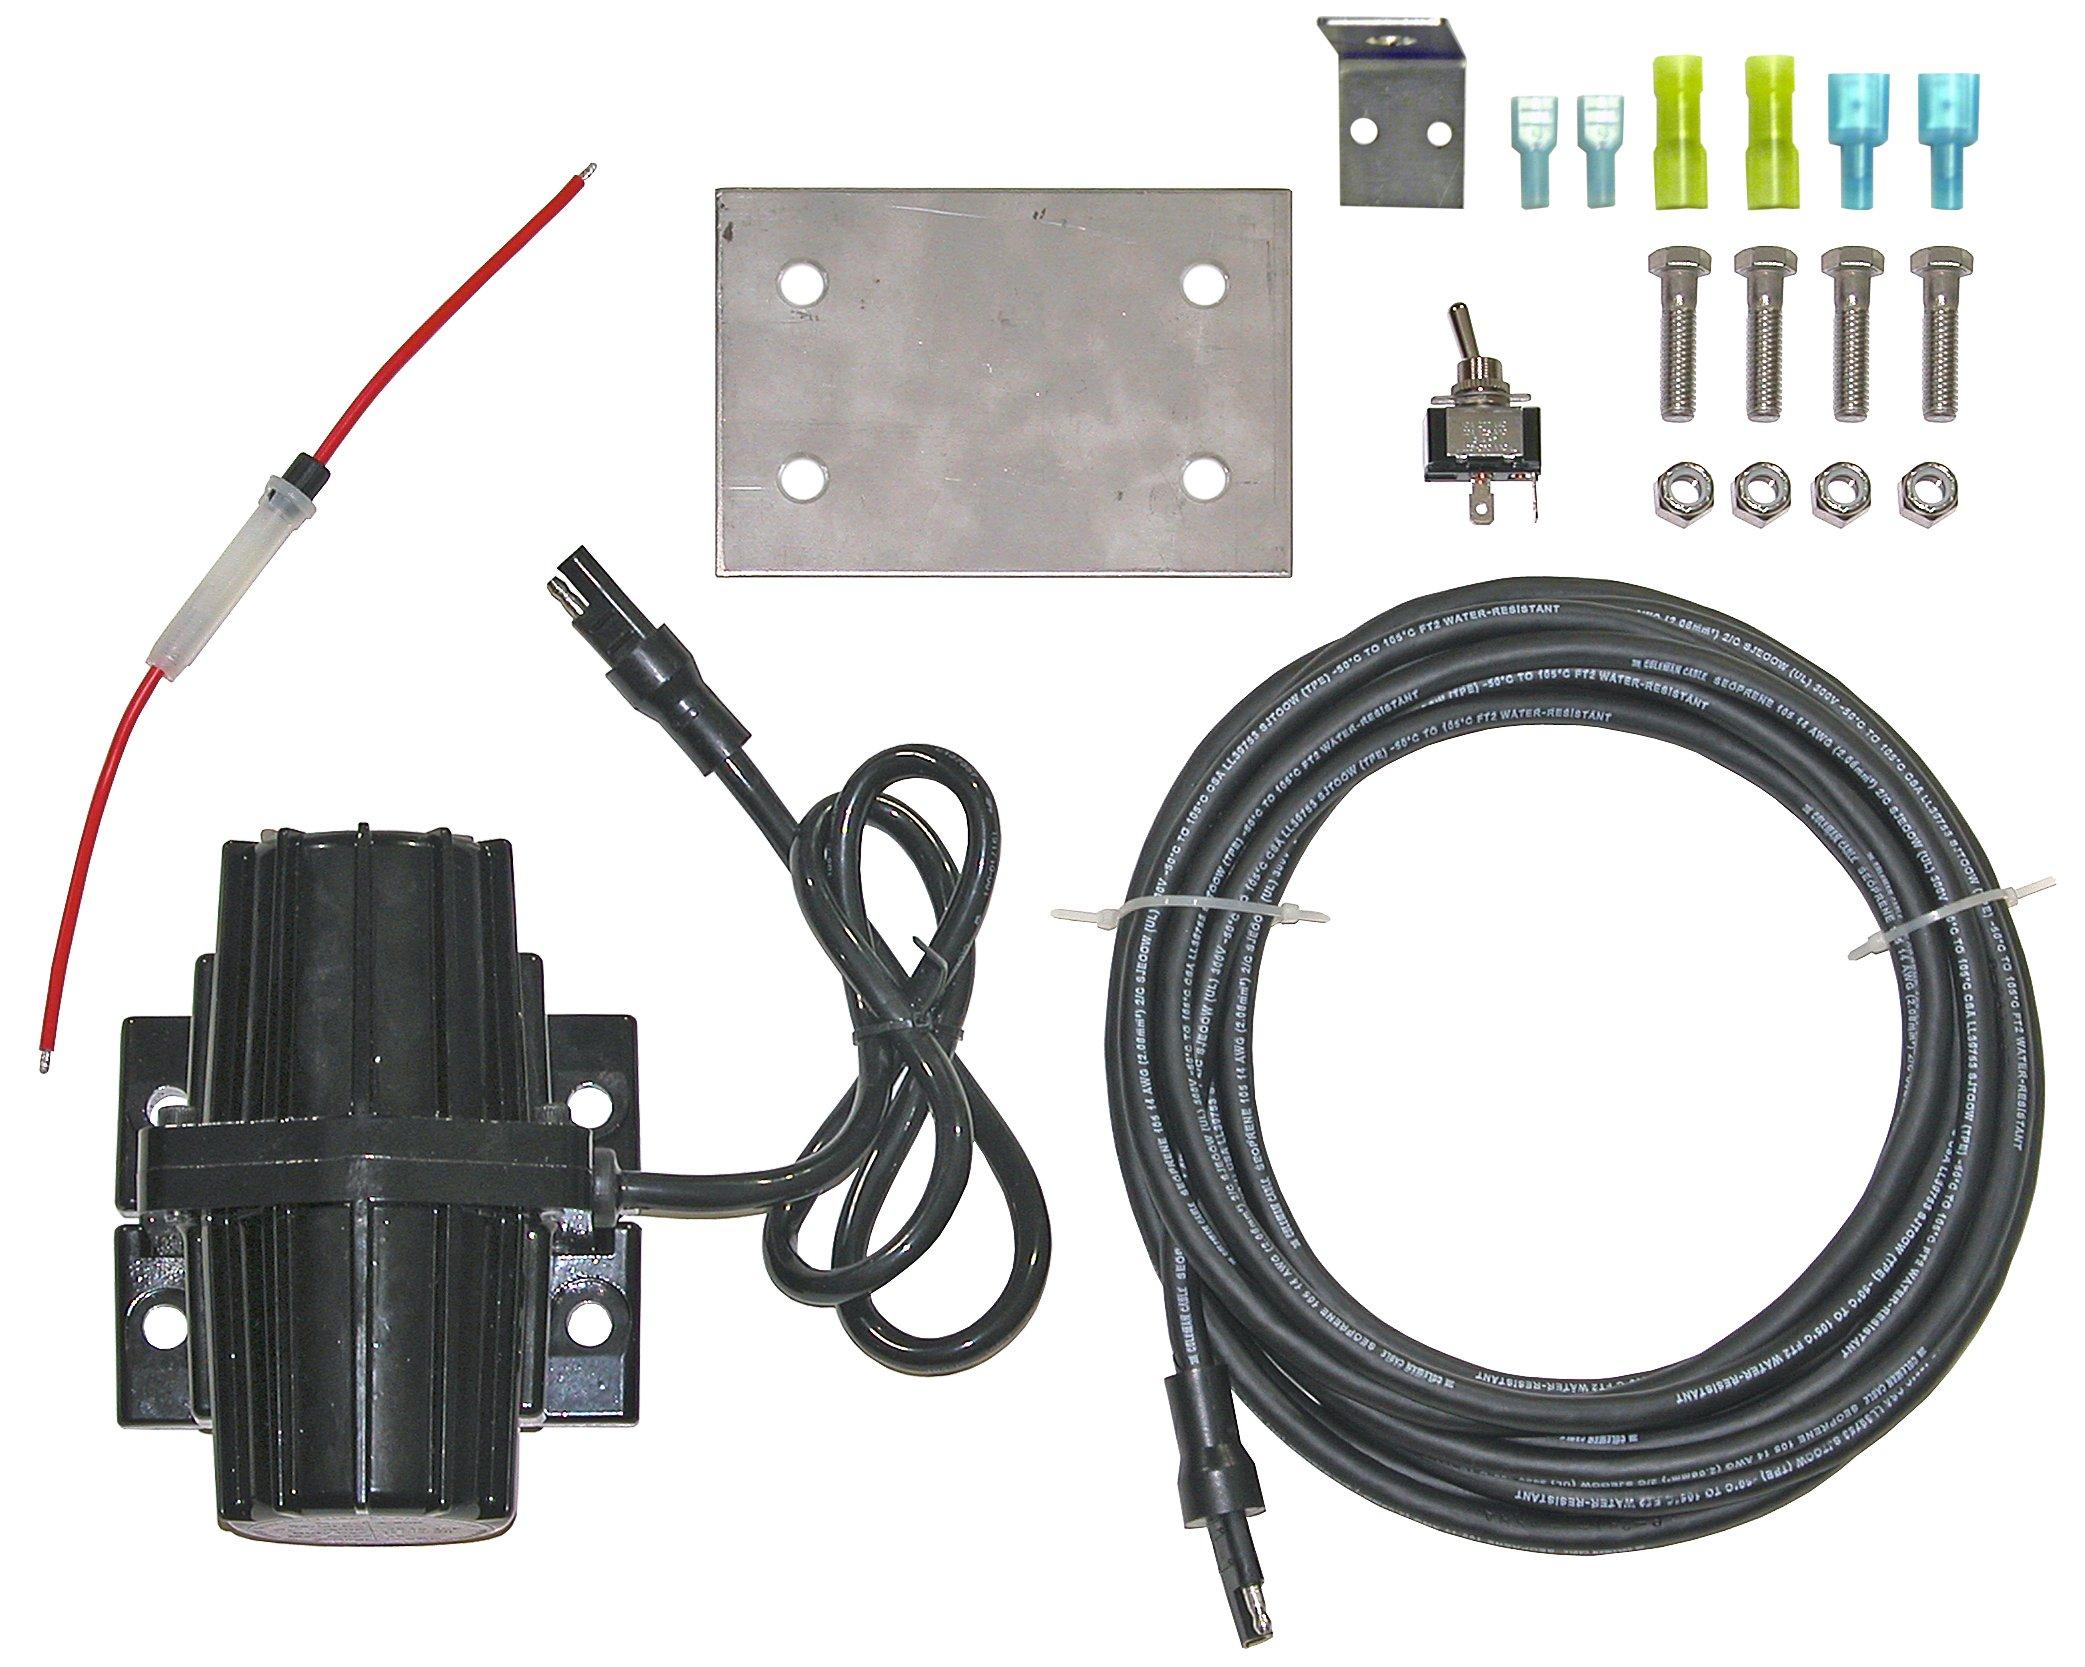 SaltDogg 3020340 200 lb Vibrator for TGS03 Tailgate Spreader